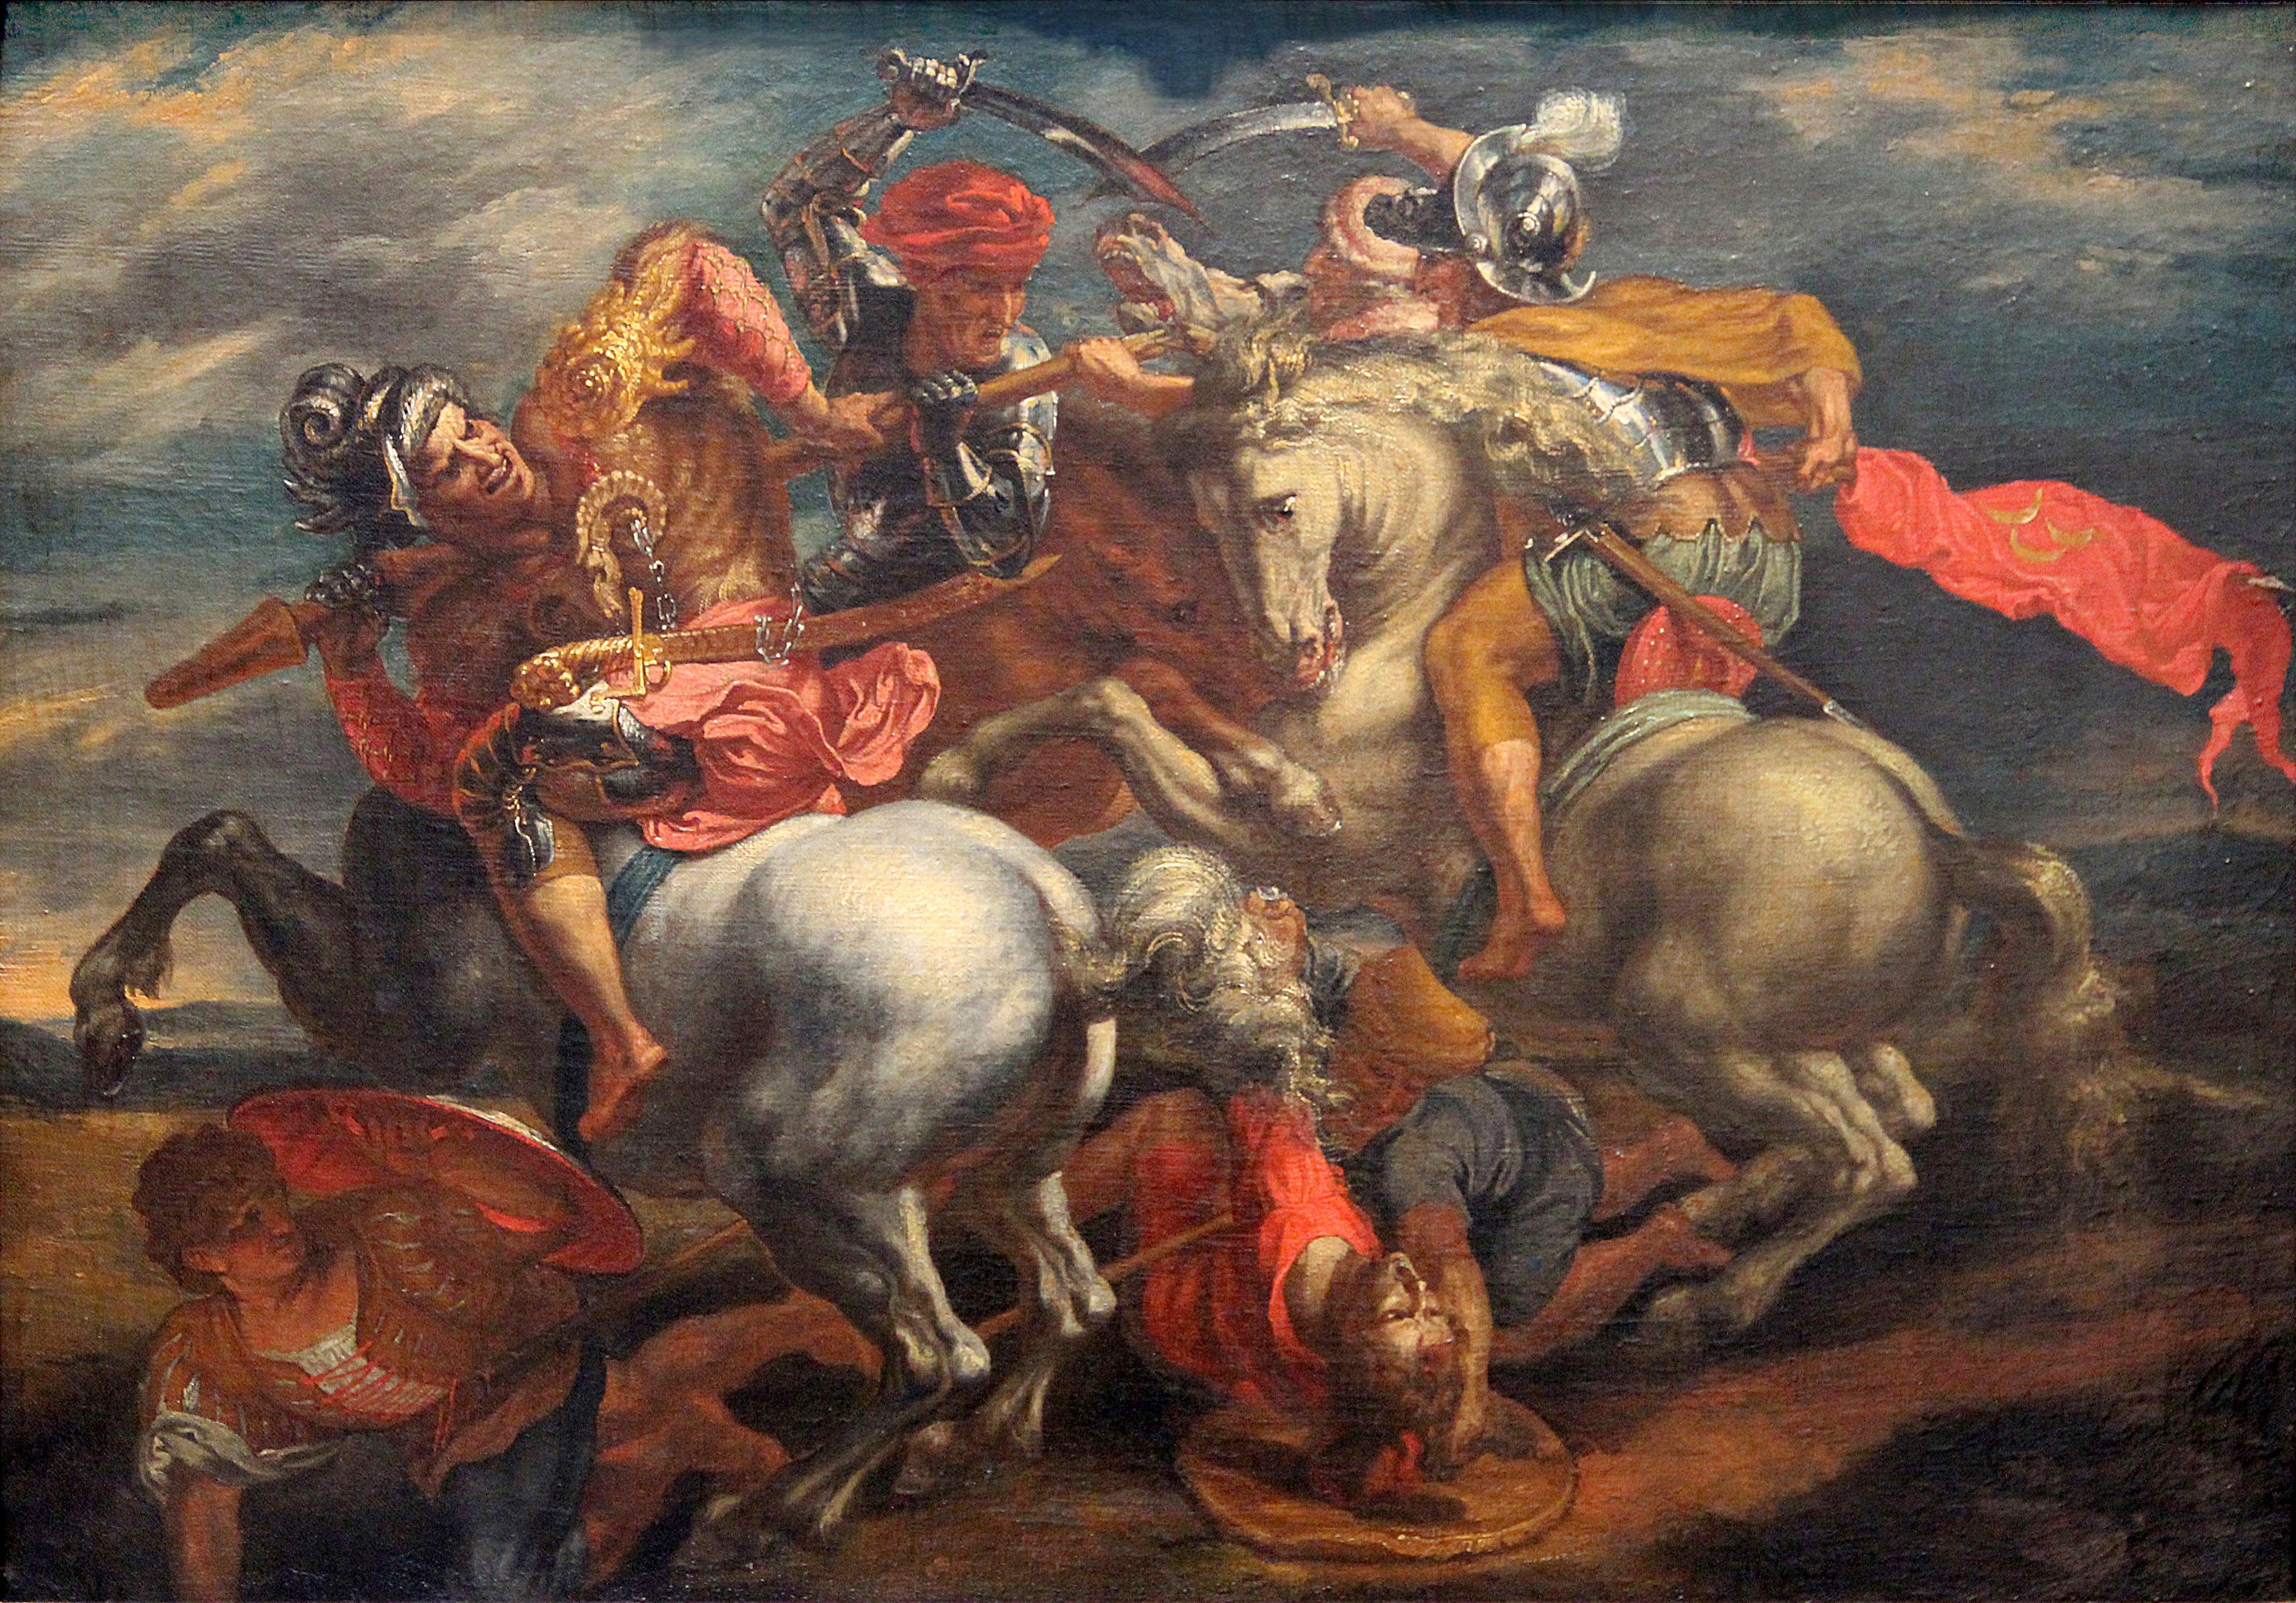 0 La bataille d'Anghiari - Rubens (1)